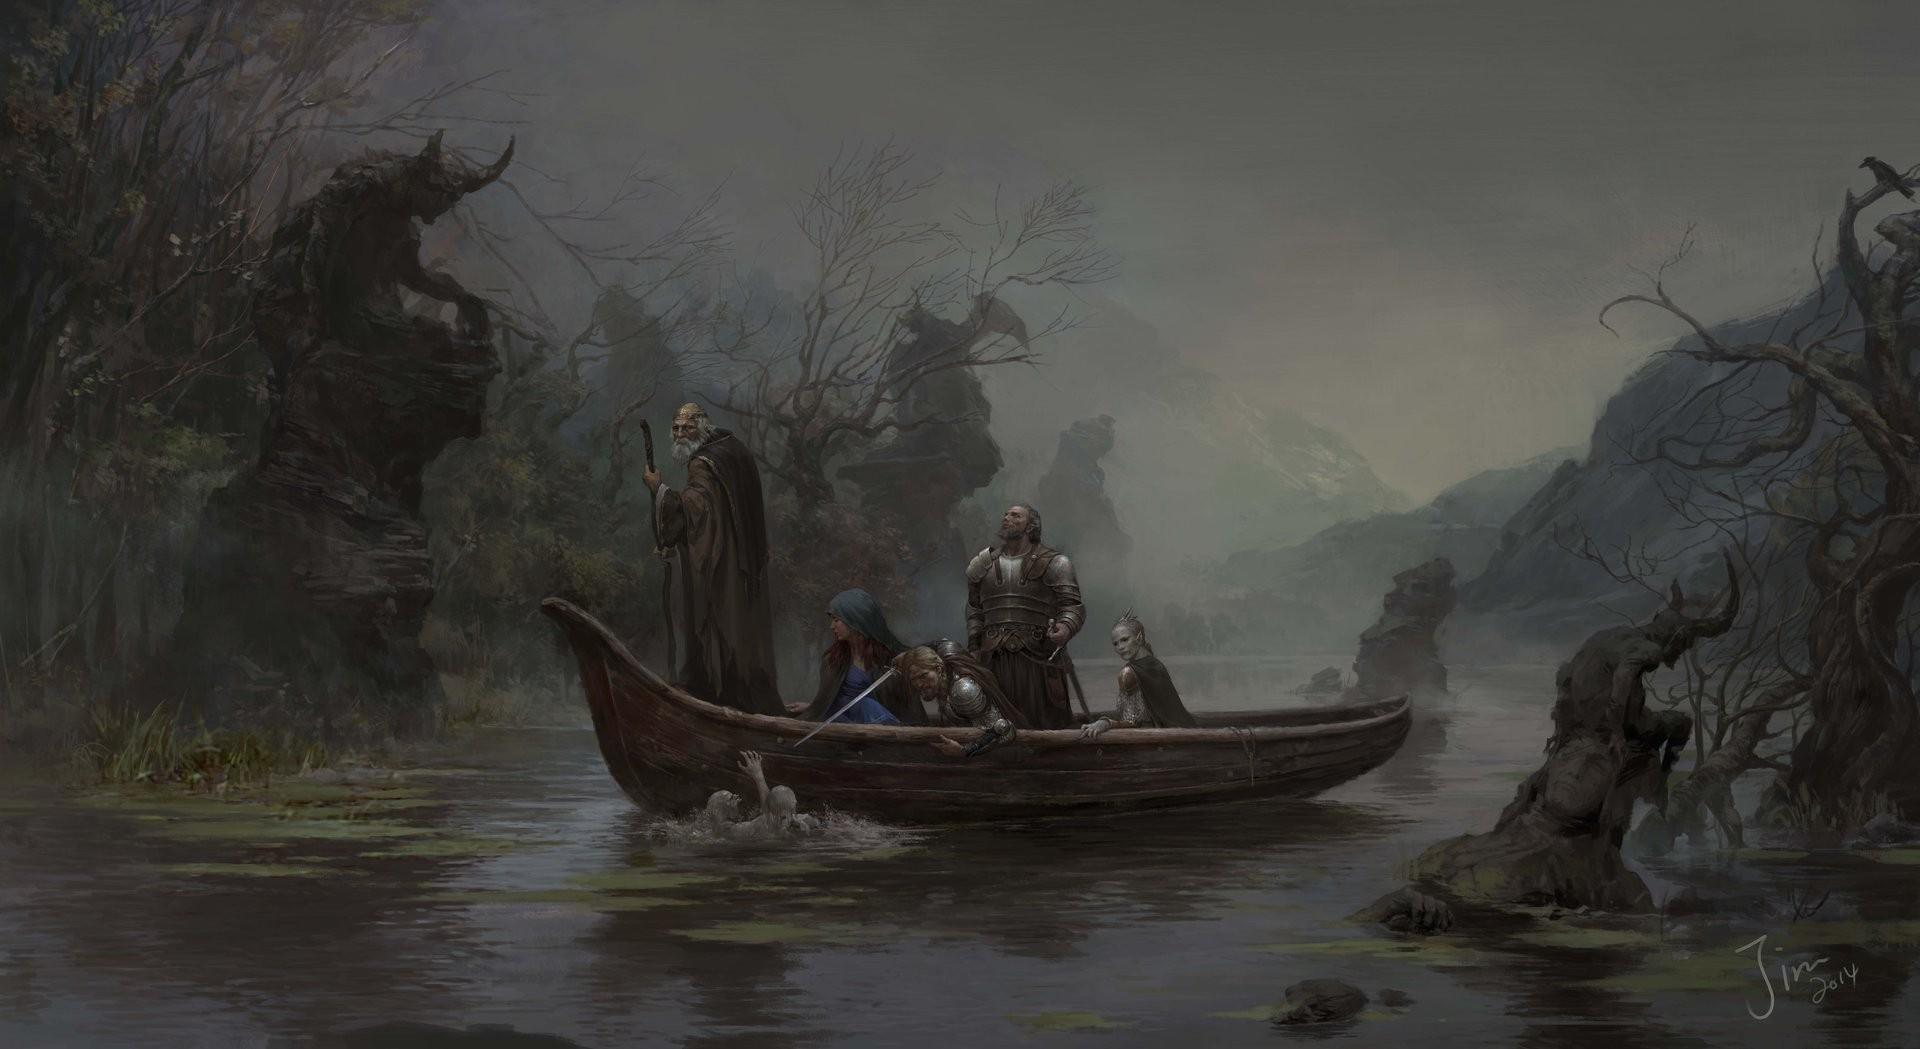 riverboat.jpg